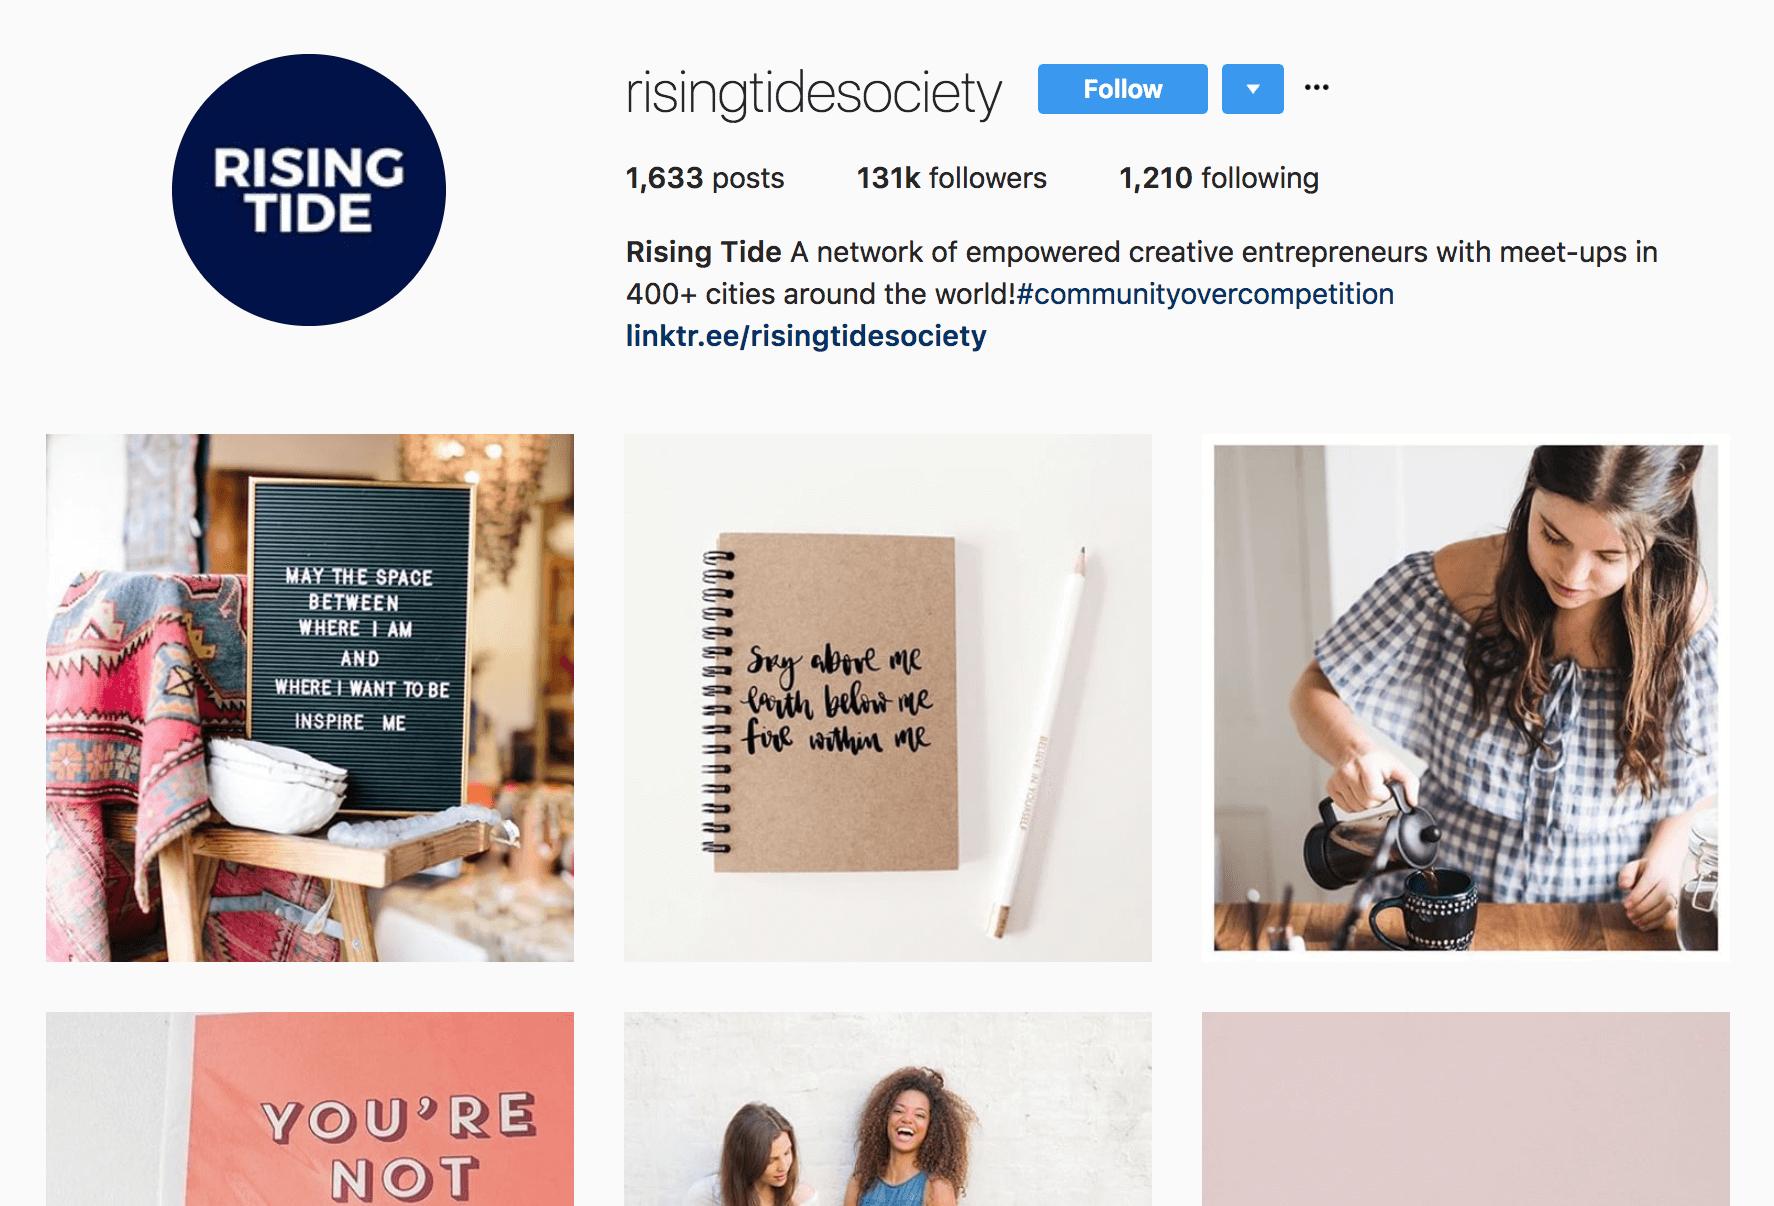 rising tide instagram.png